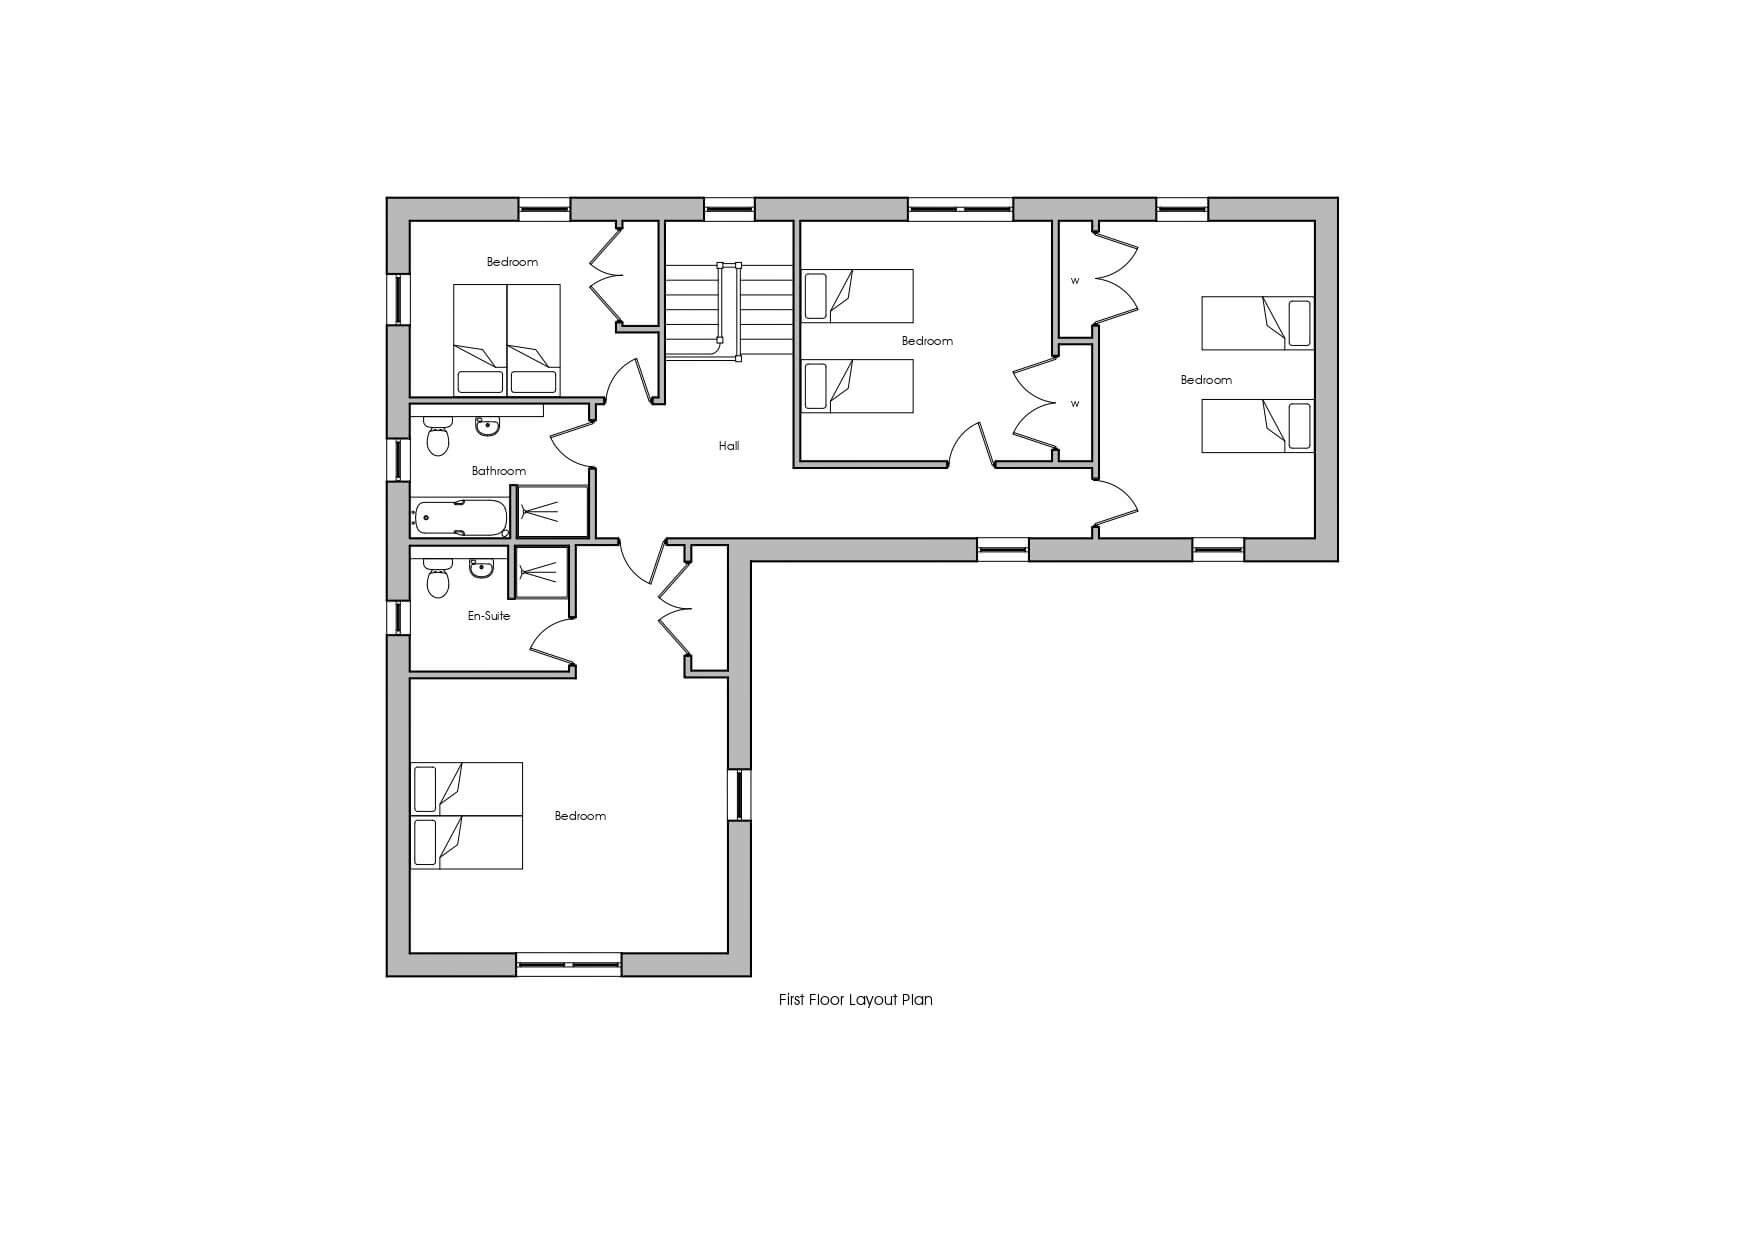 Red-Gauntlet-First-Floor-Plan-2019.jpg